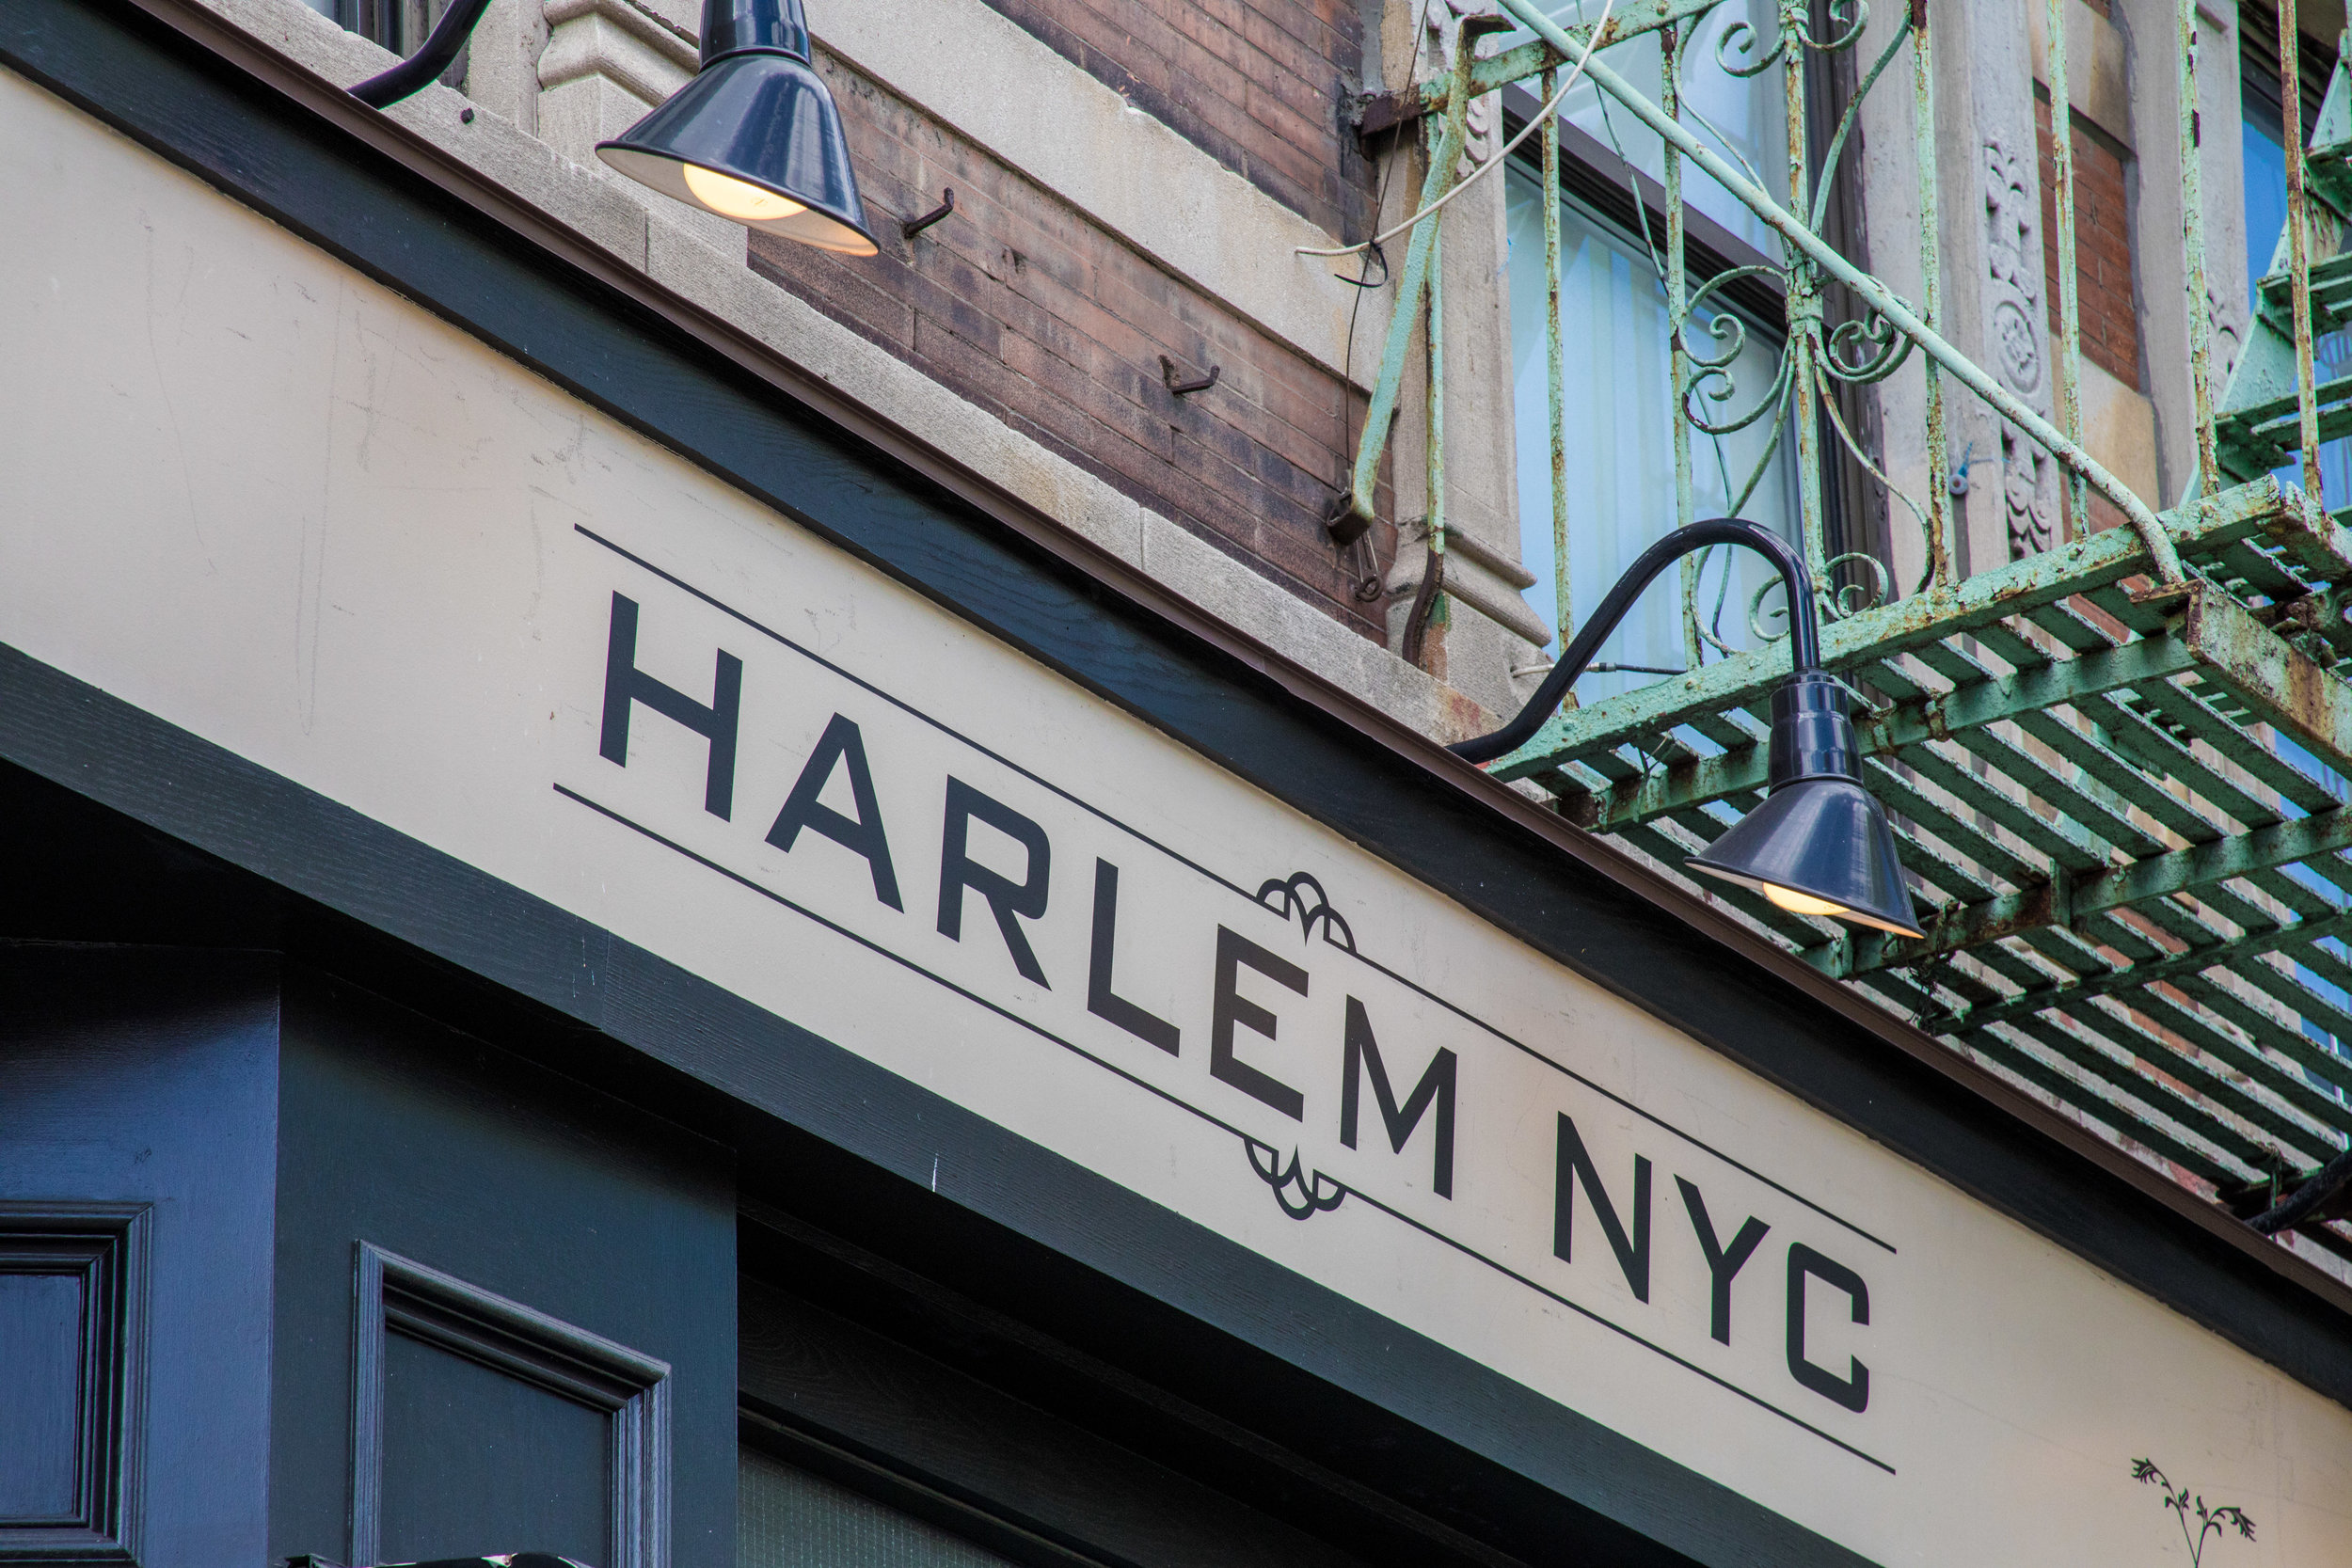 LSNY_Harlem-62.jpg